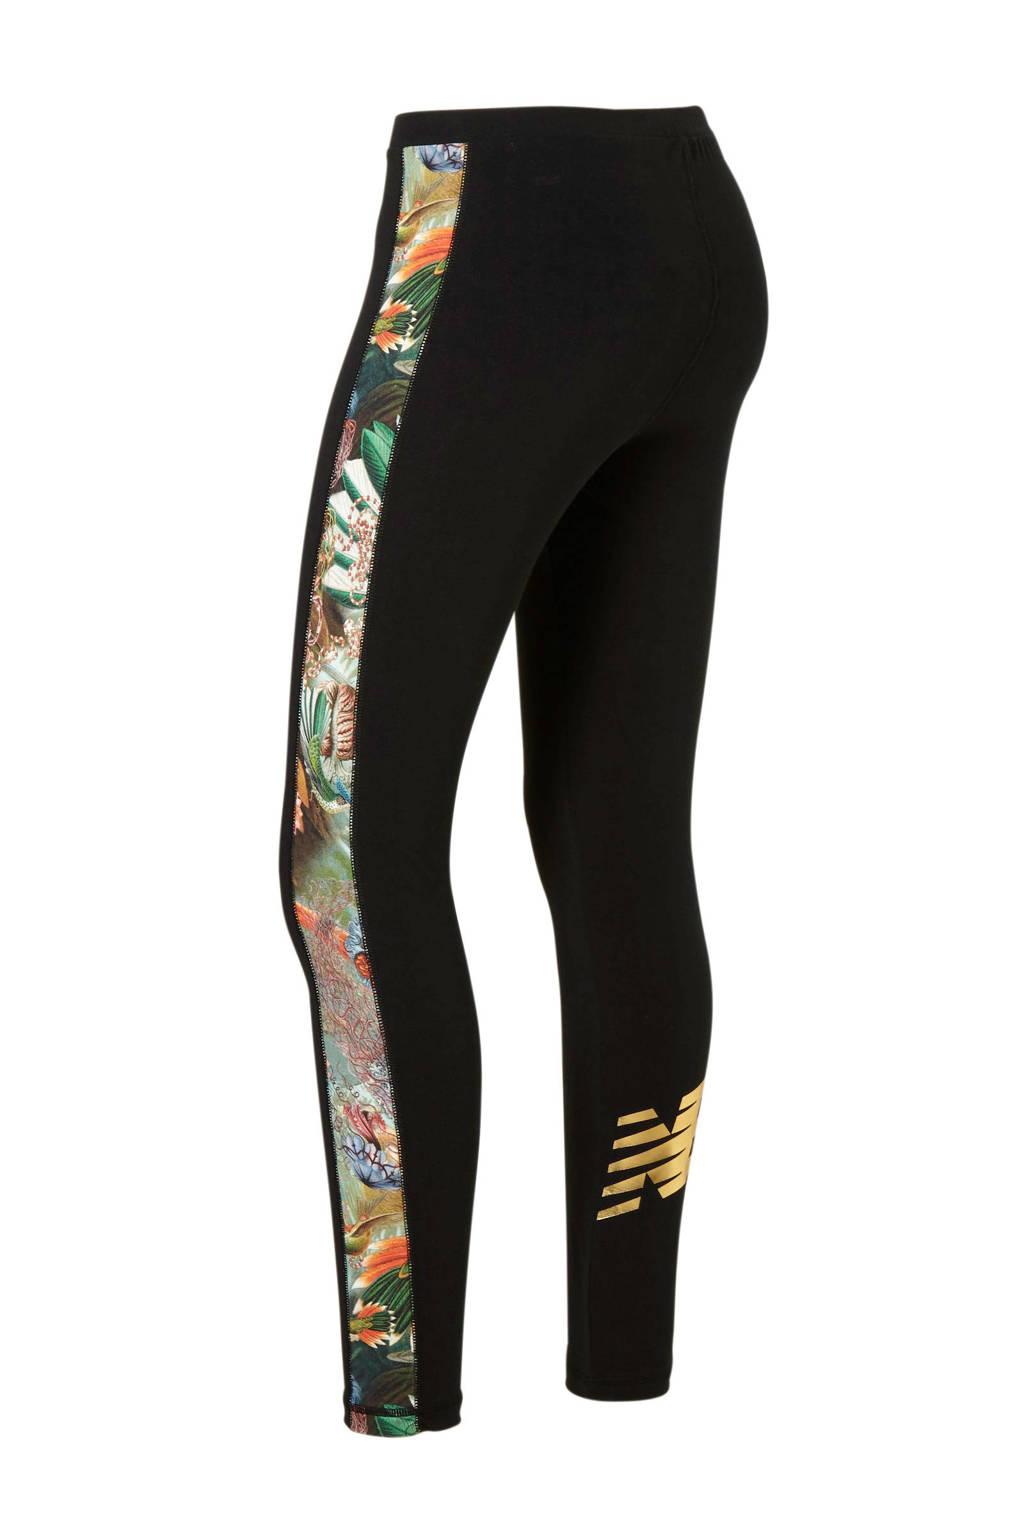 New Balance 7/8 legging, Zwart/bloemen